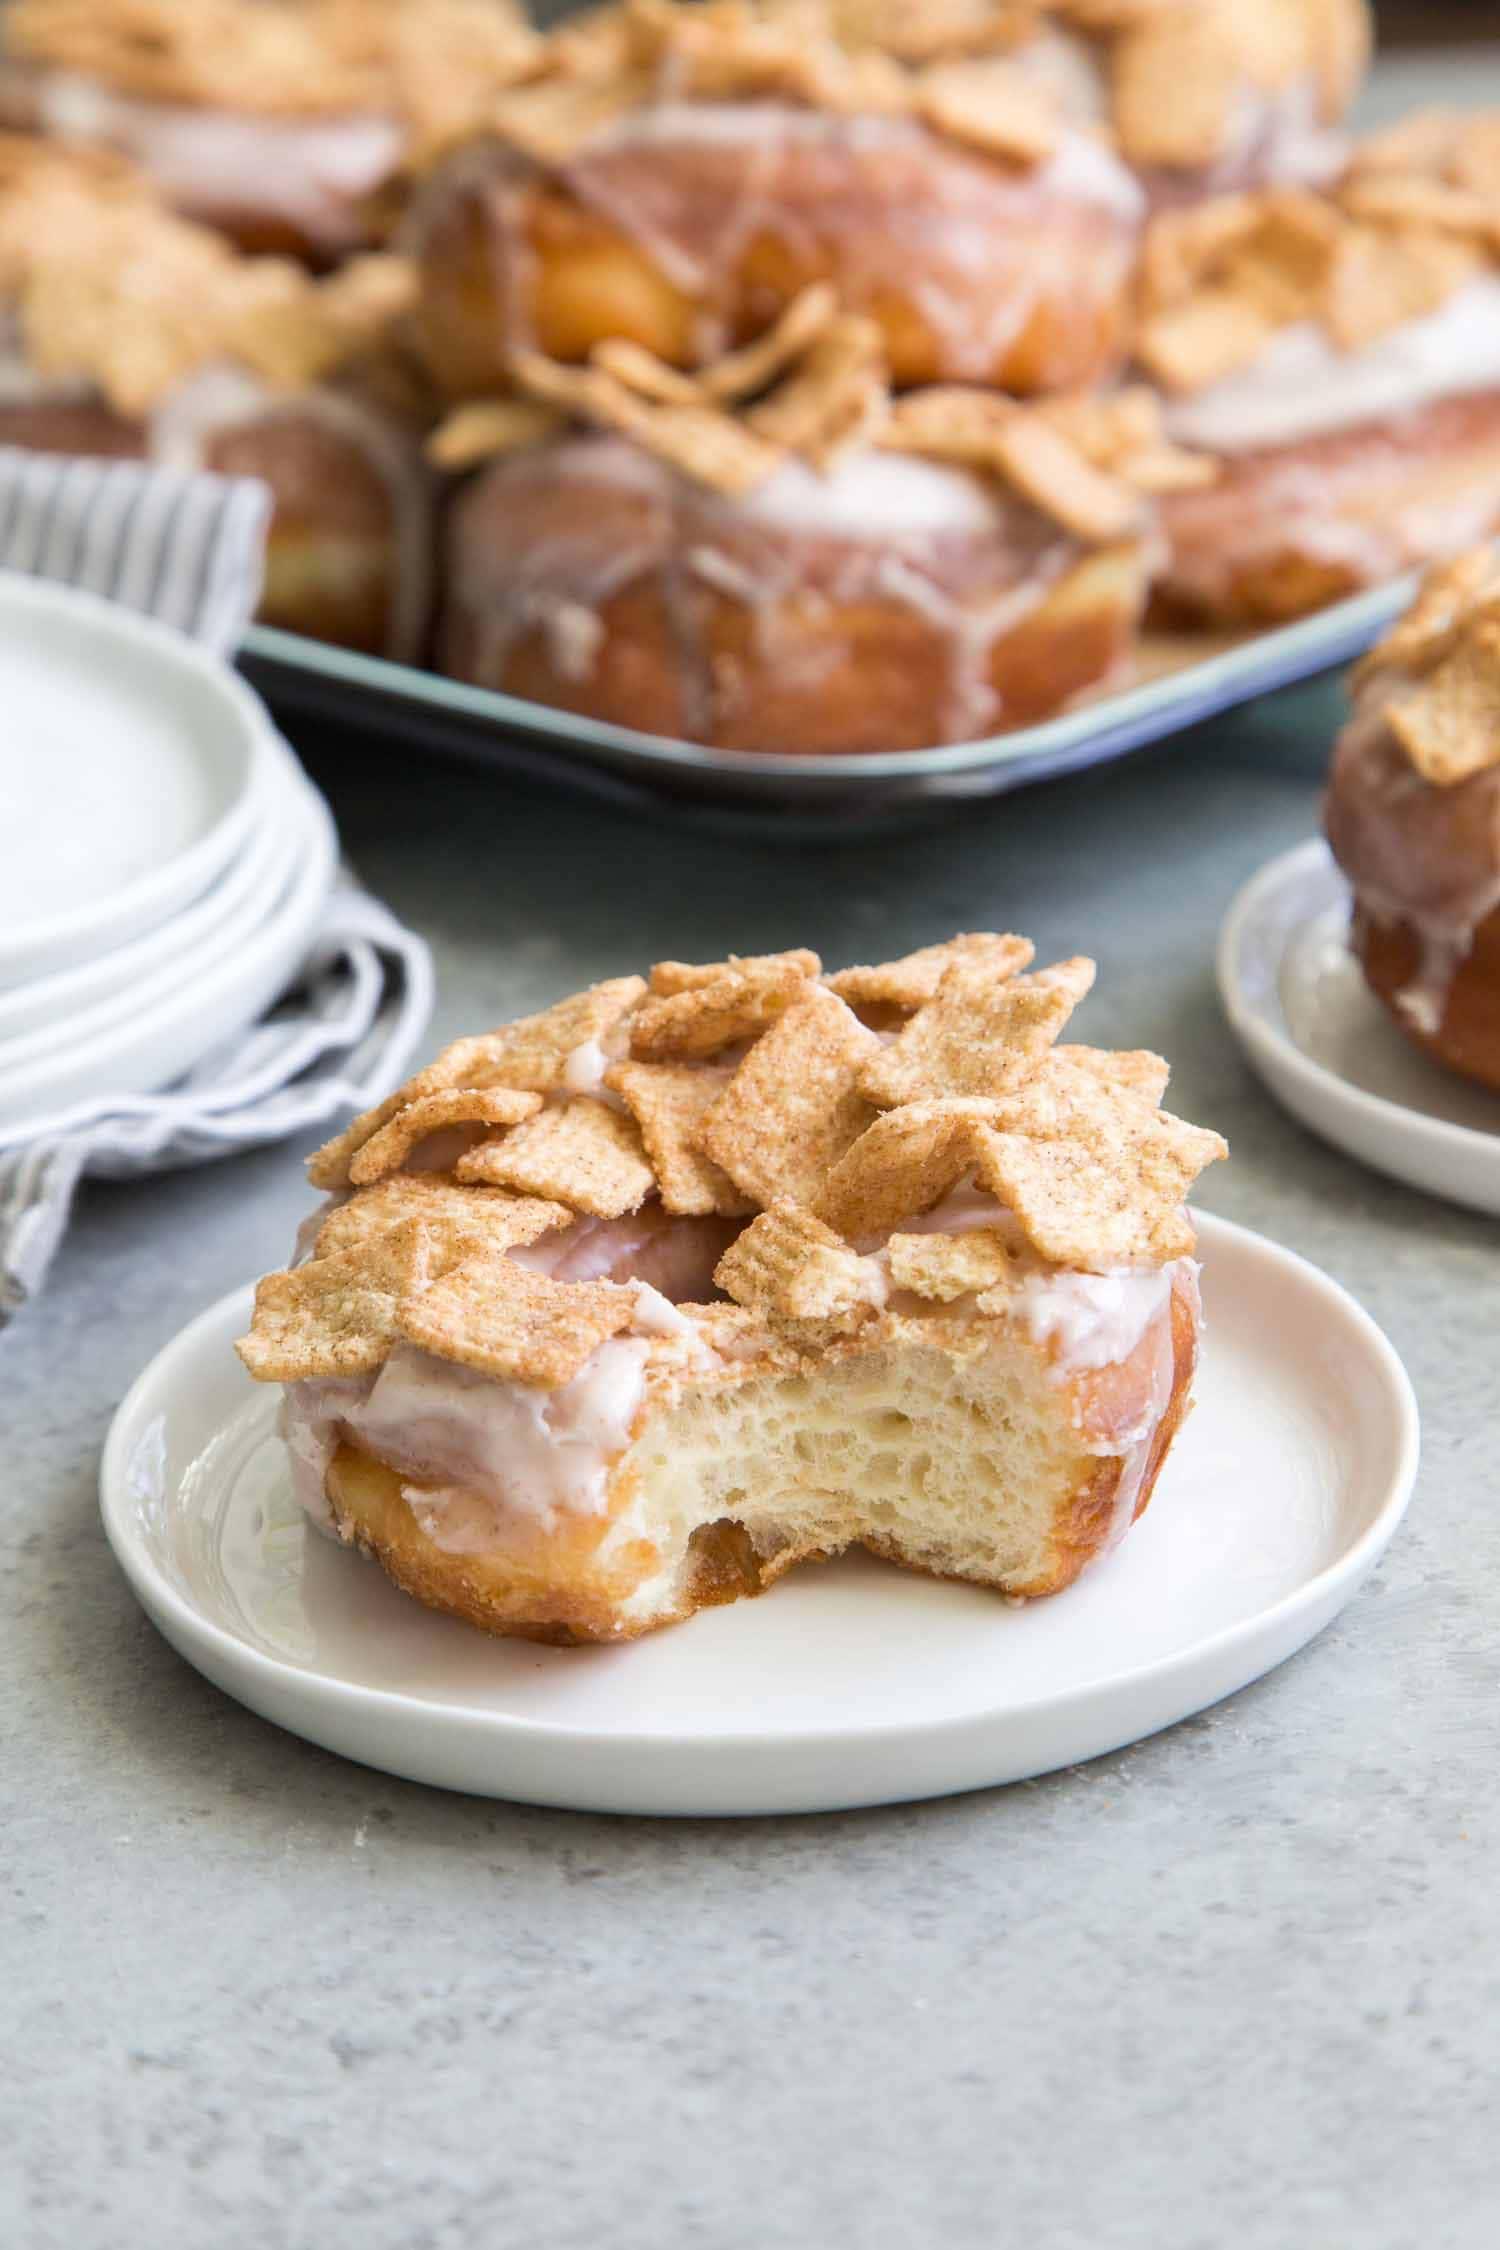 Cinnamon Toast Crunch Doughnuts